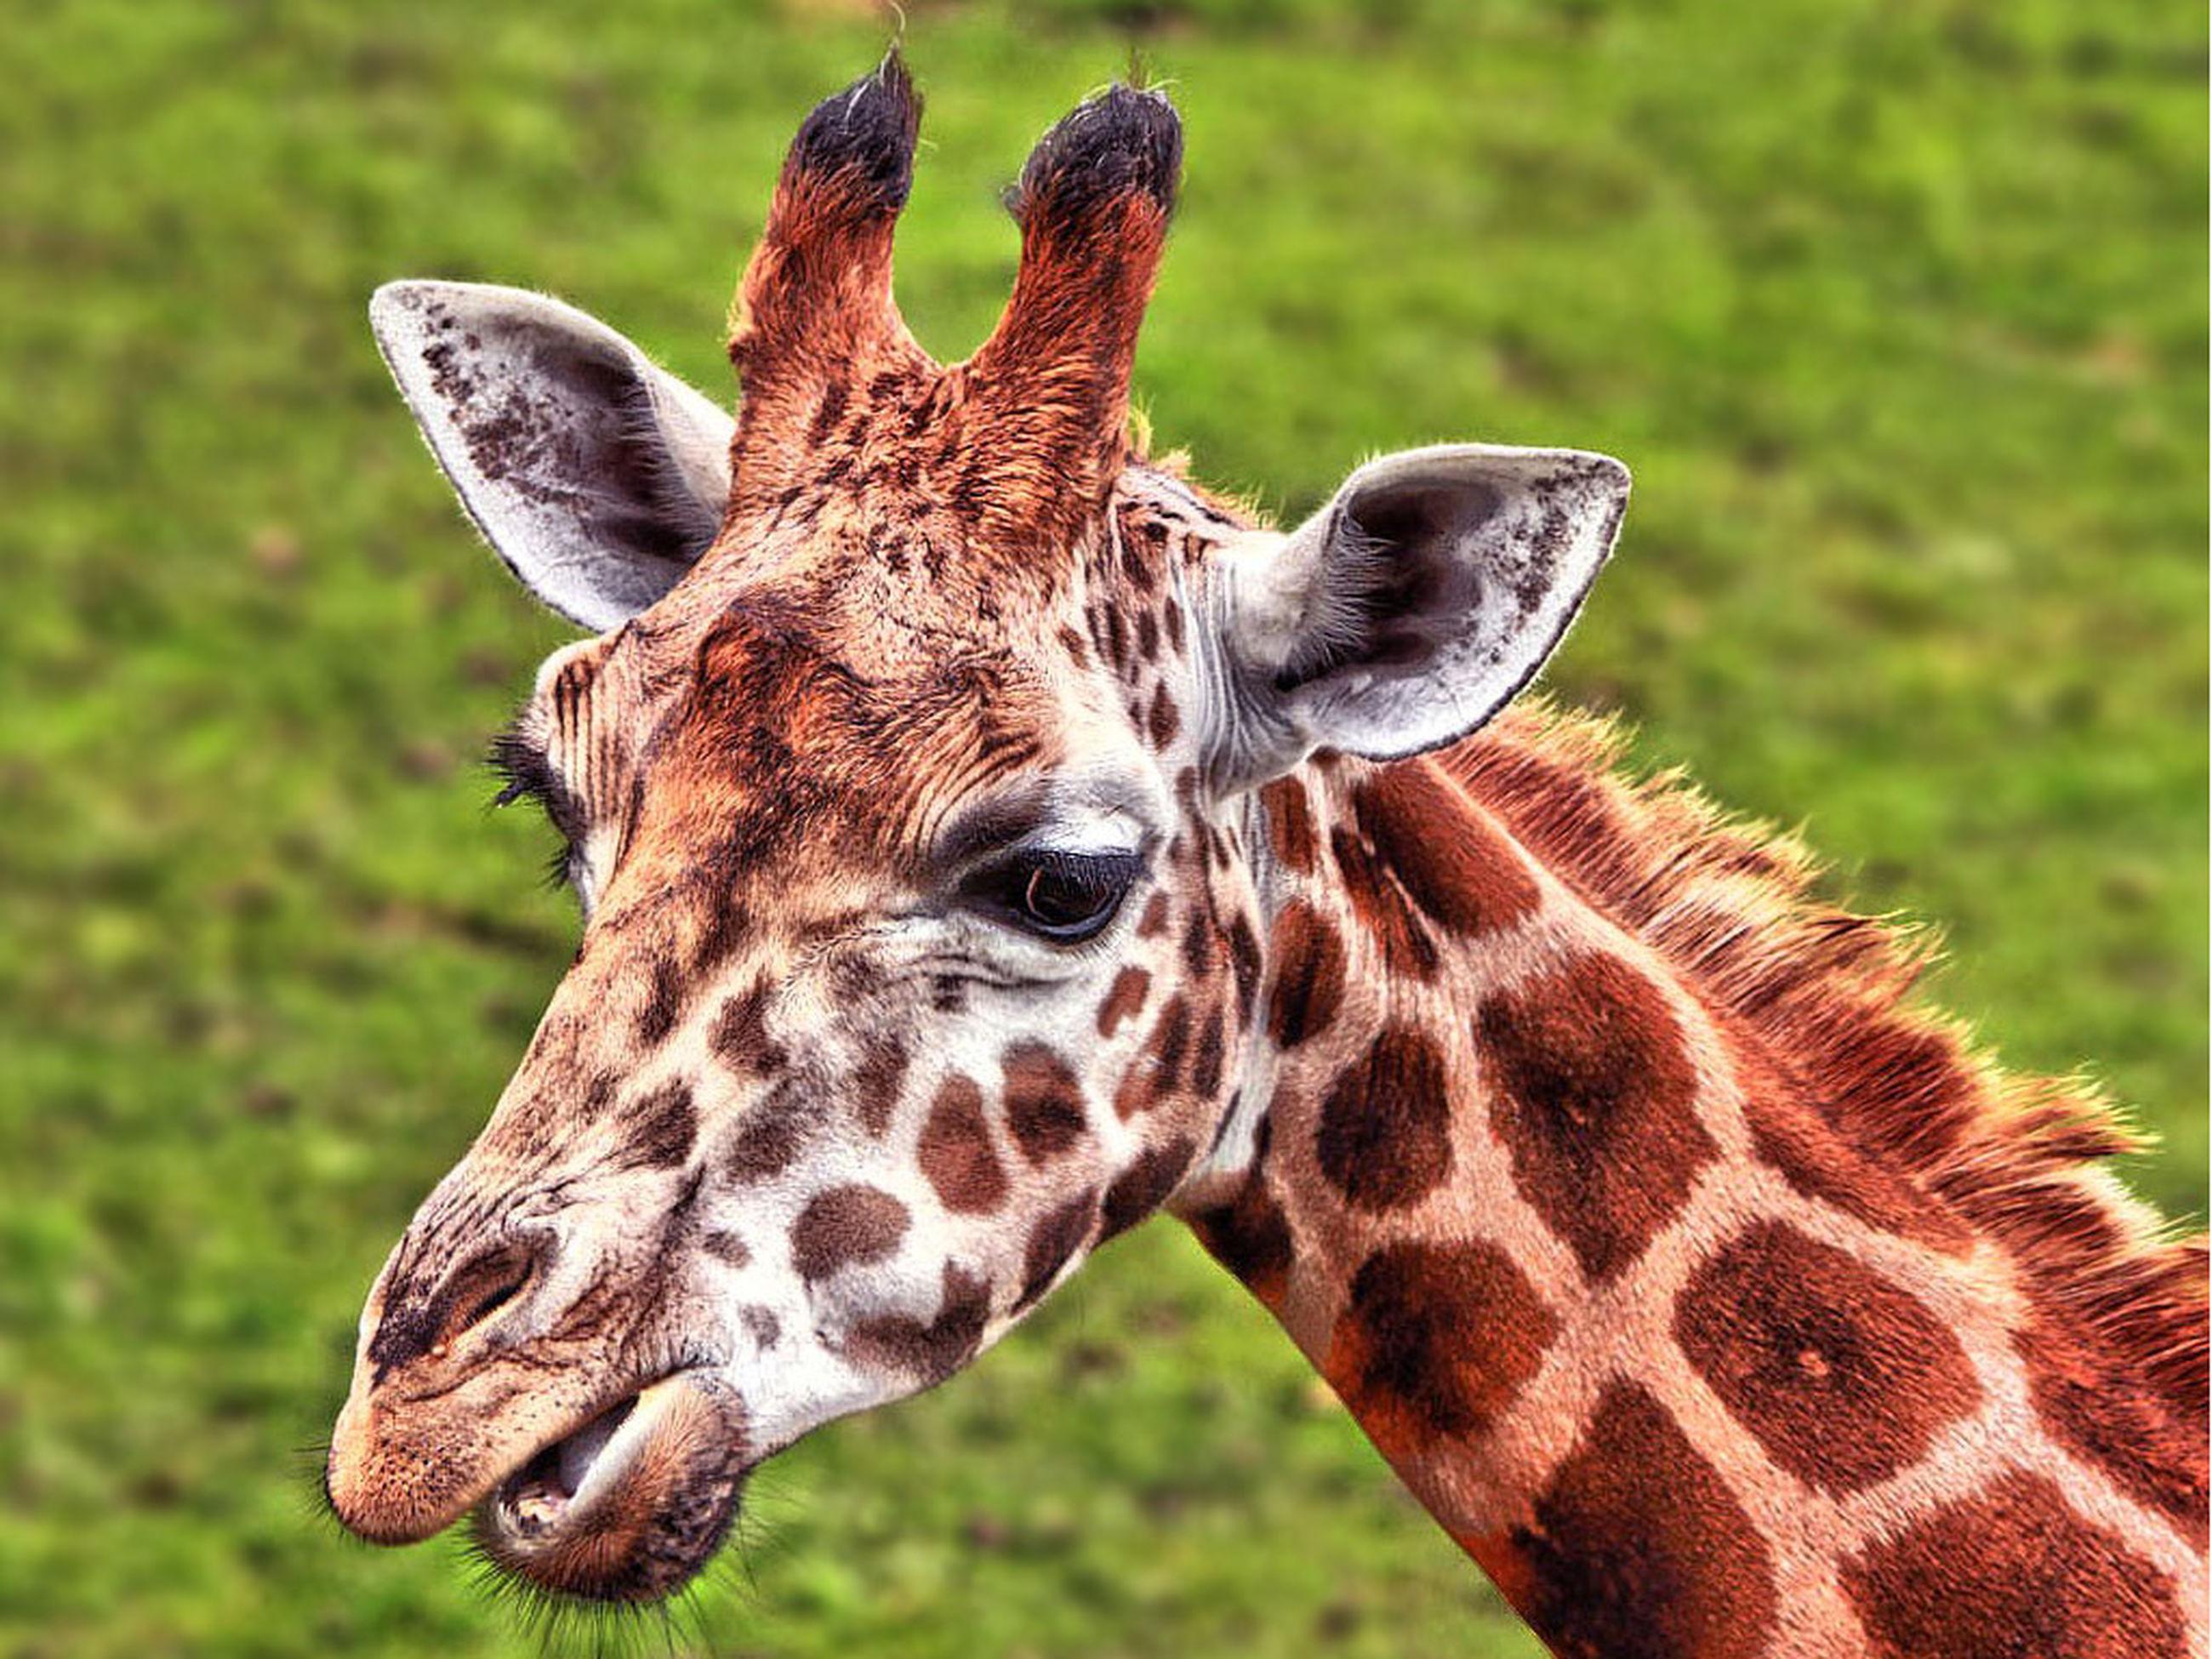 one animal, giraffe, animal wildlife, animal body part, animal head, animals in the wild, animal themes, safari animals, outdoors, mammal, day, portrait, close-up, grass, looking at camera, no people, animal markings, nature